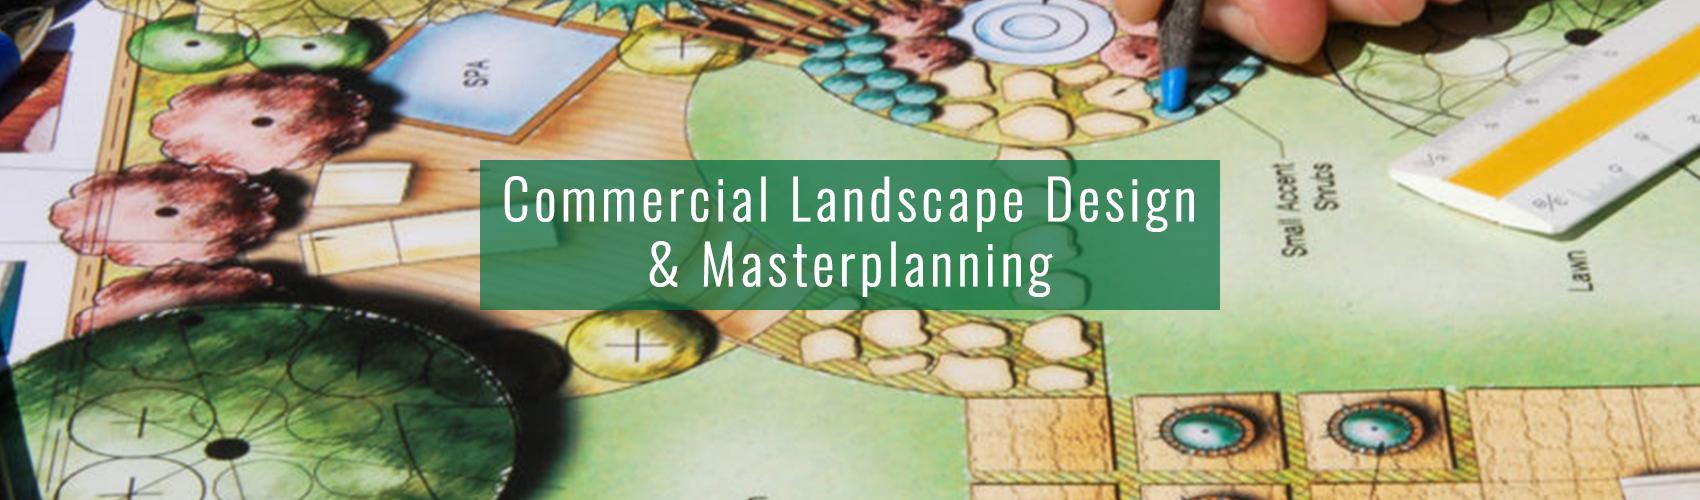 Commercial Landscape Design & Masterplanning from Complete Landscaping Service